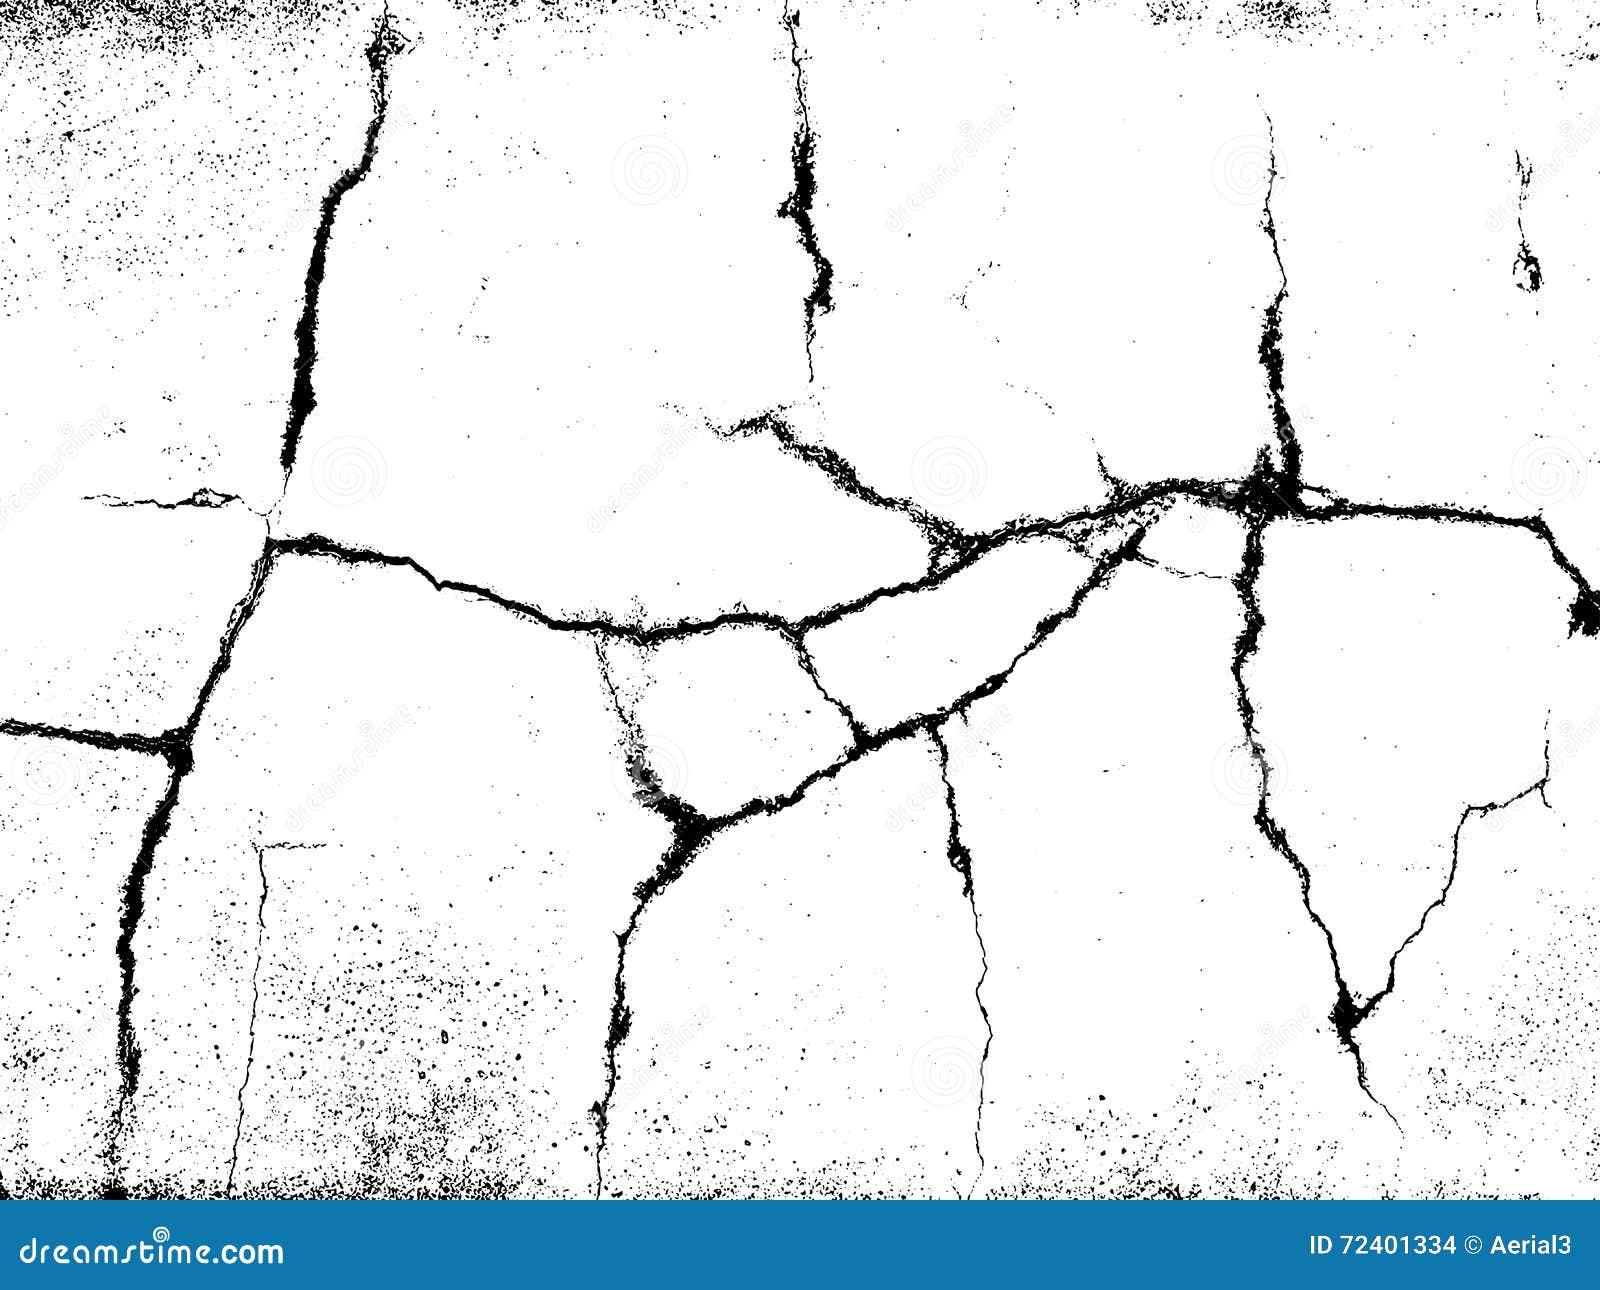 Cracks texture overlay. Vector background